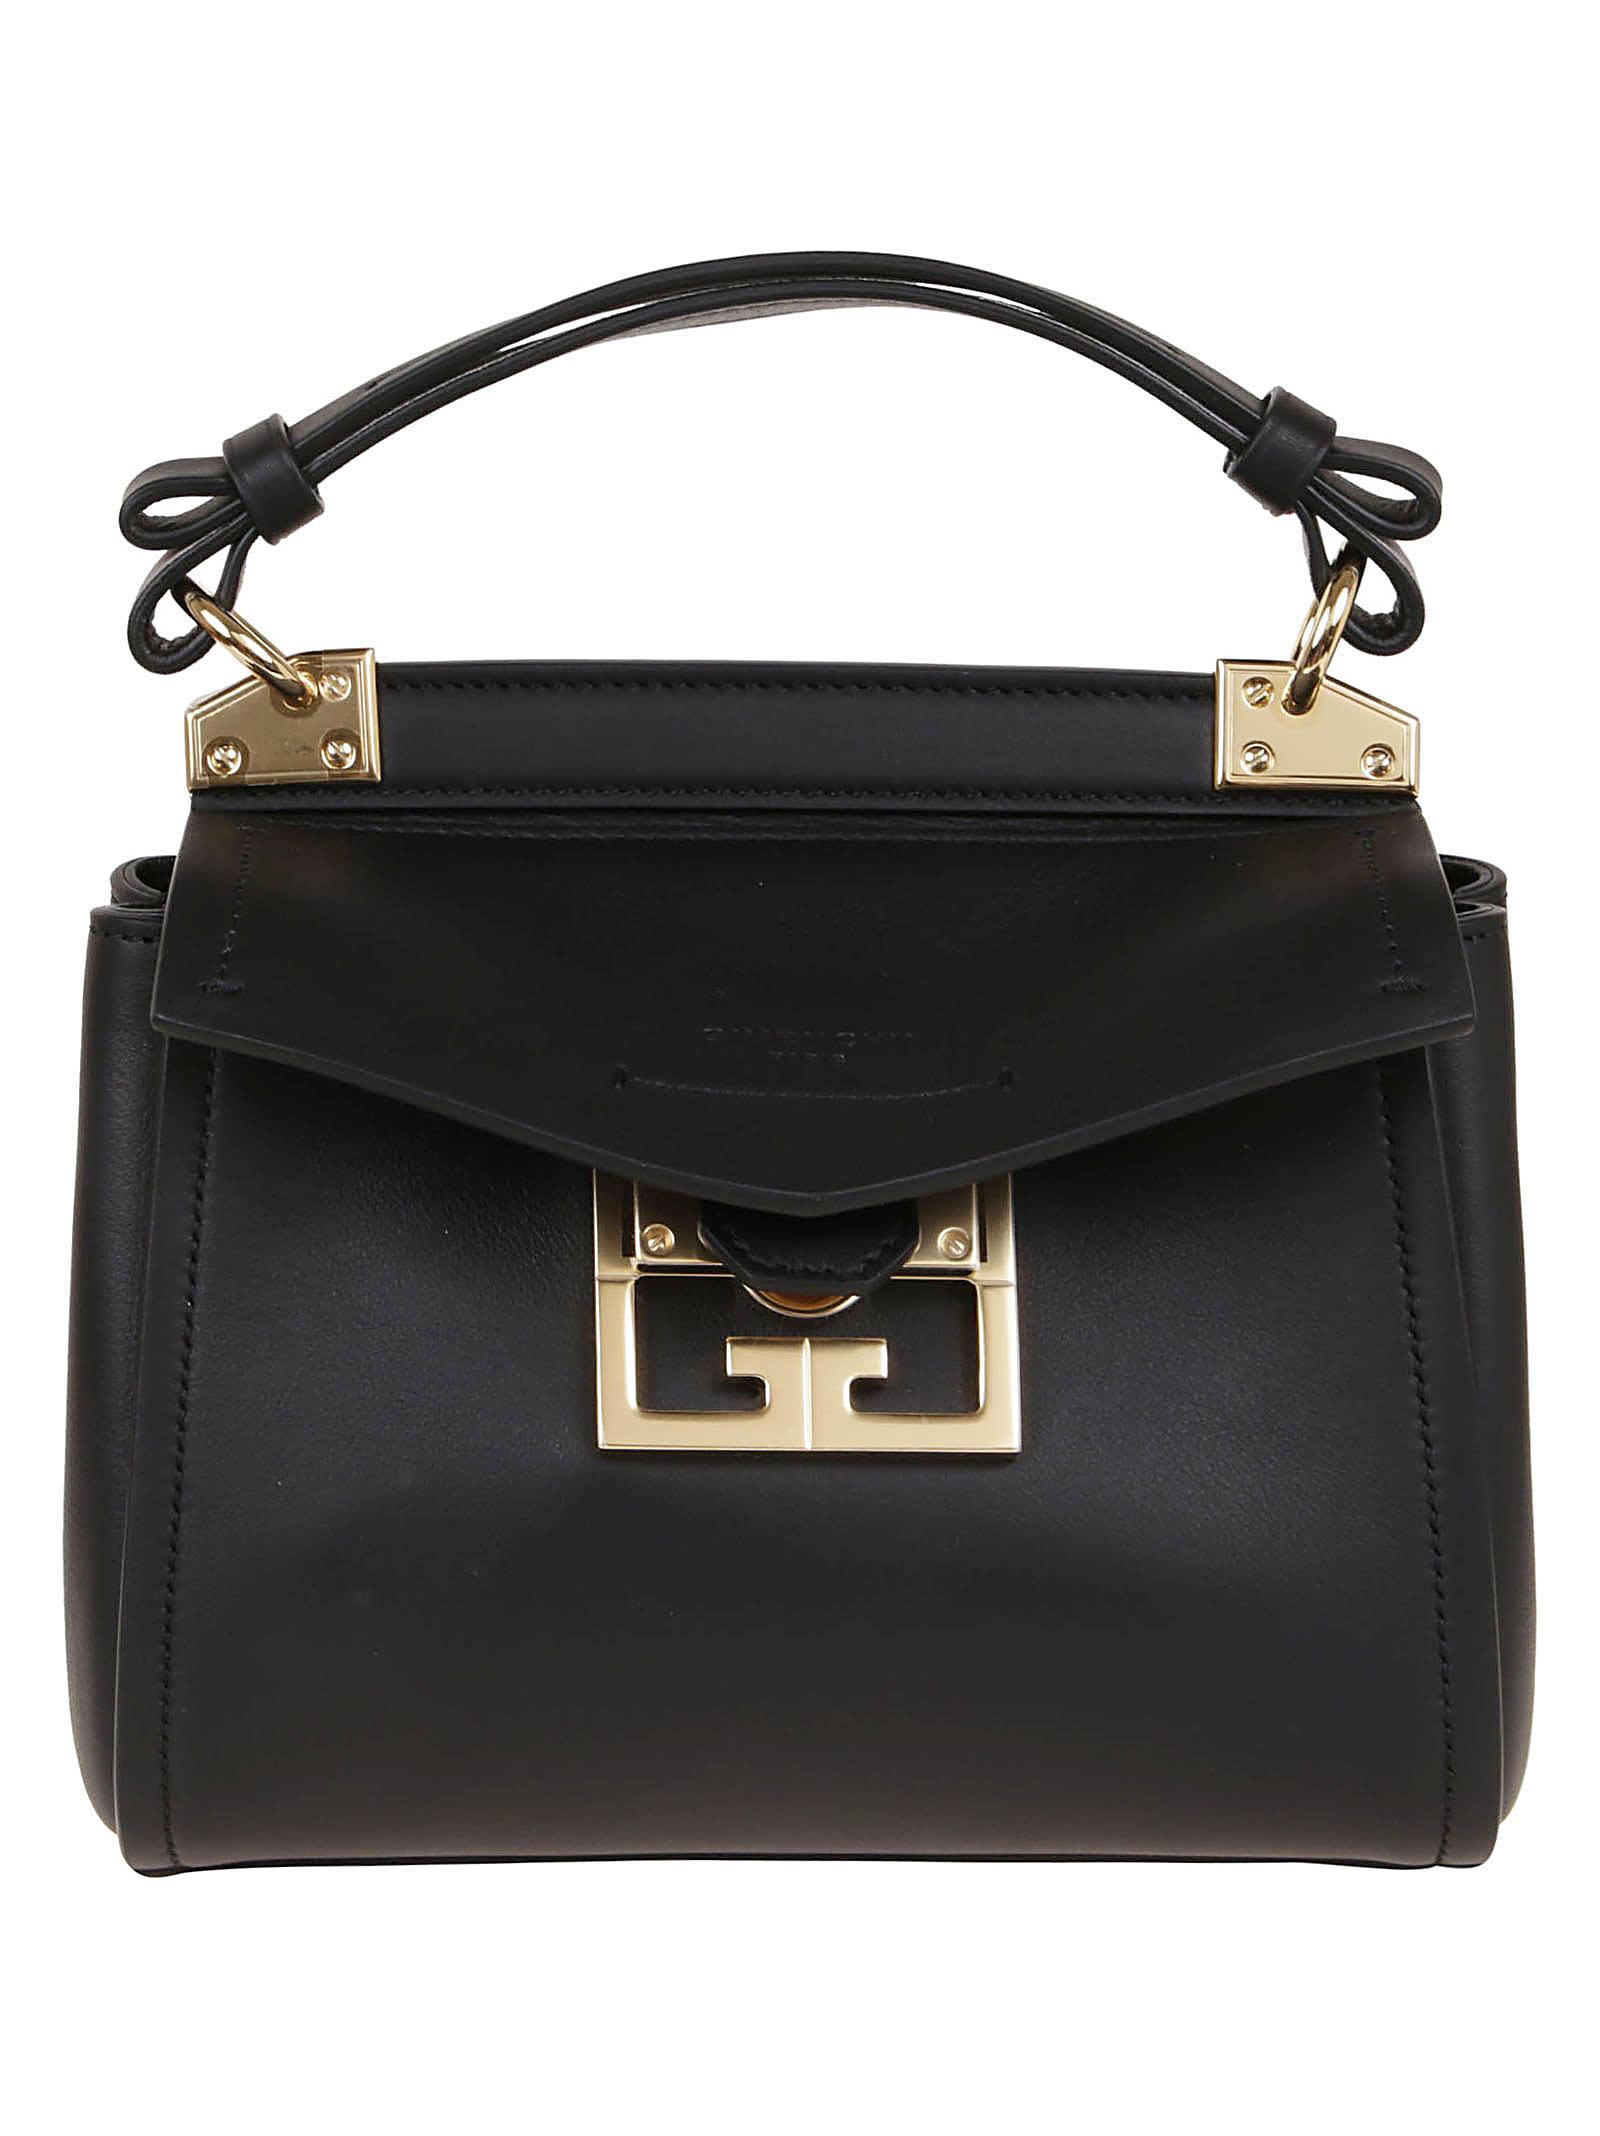 Givenchy Mystic Mini Bag